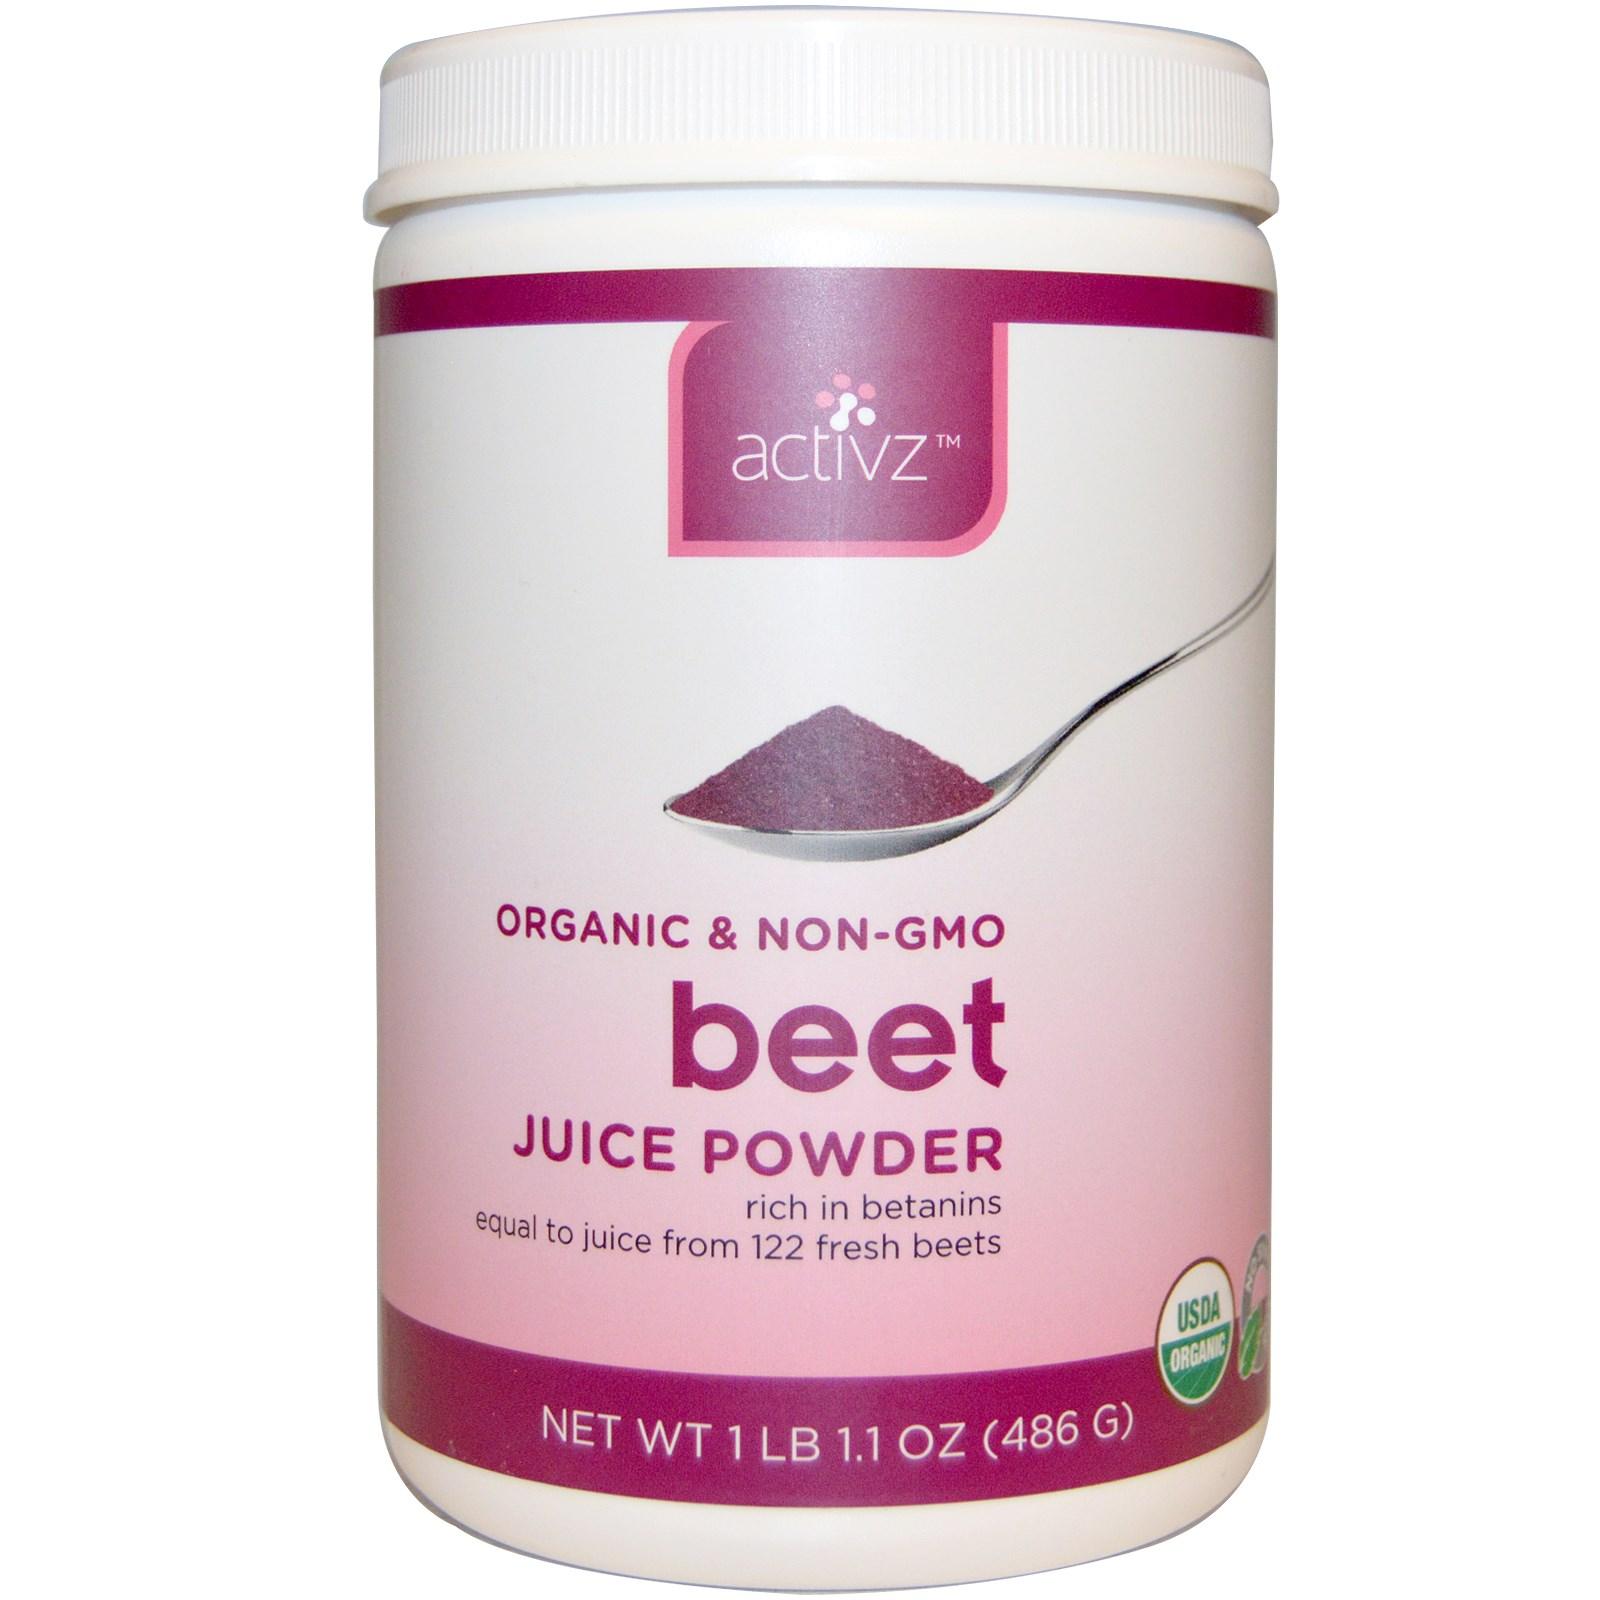 Organic juice powder